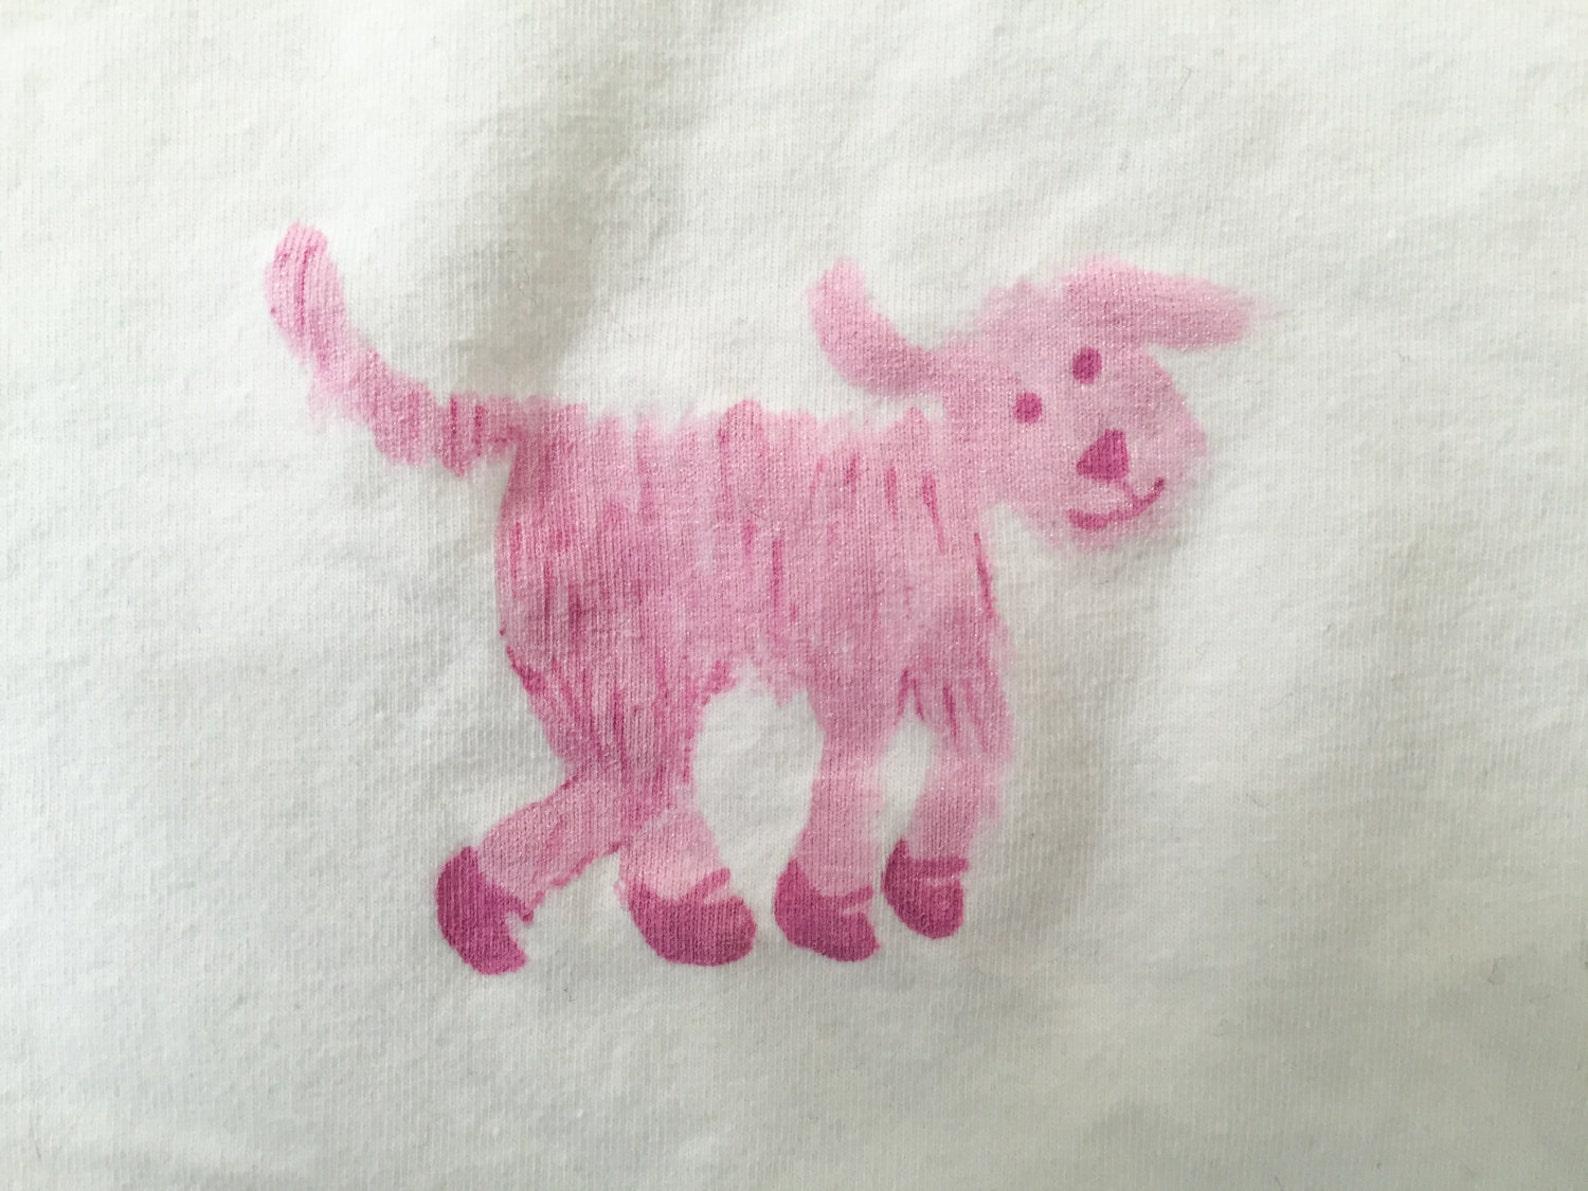 cute little girls shirt, cotton kids tshirt, cute girl's t-shirt, pink t-shirt, t-shirt with dog, ballet shoes